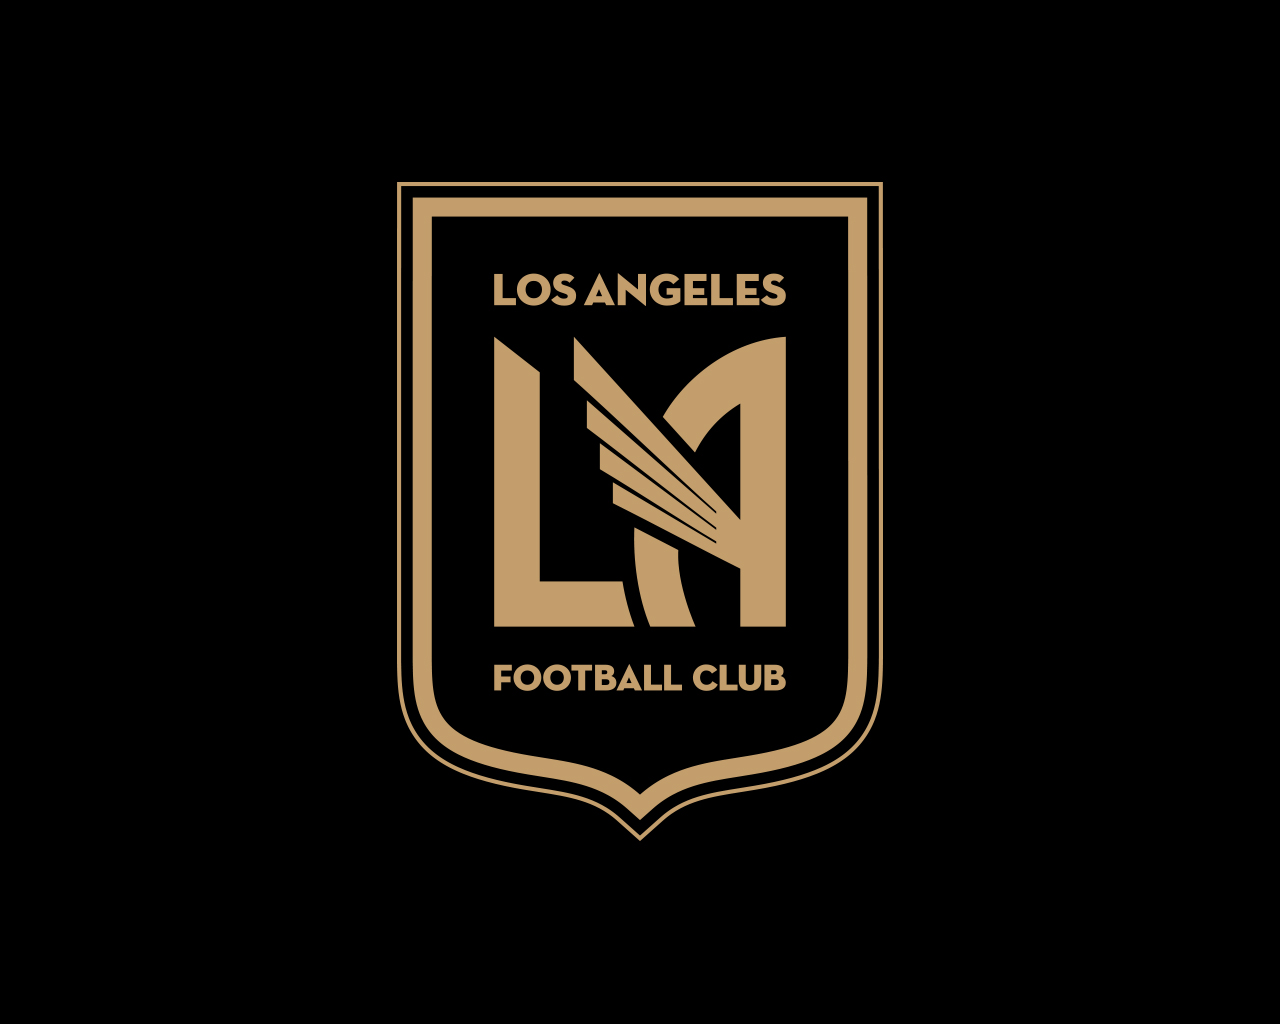 LAFC-SocialMedia-1280x1024.jpg